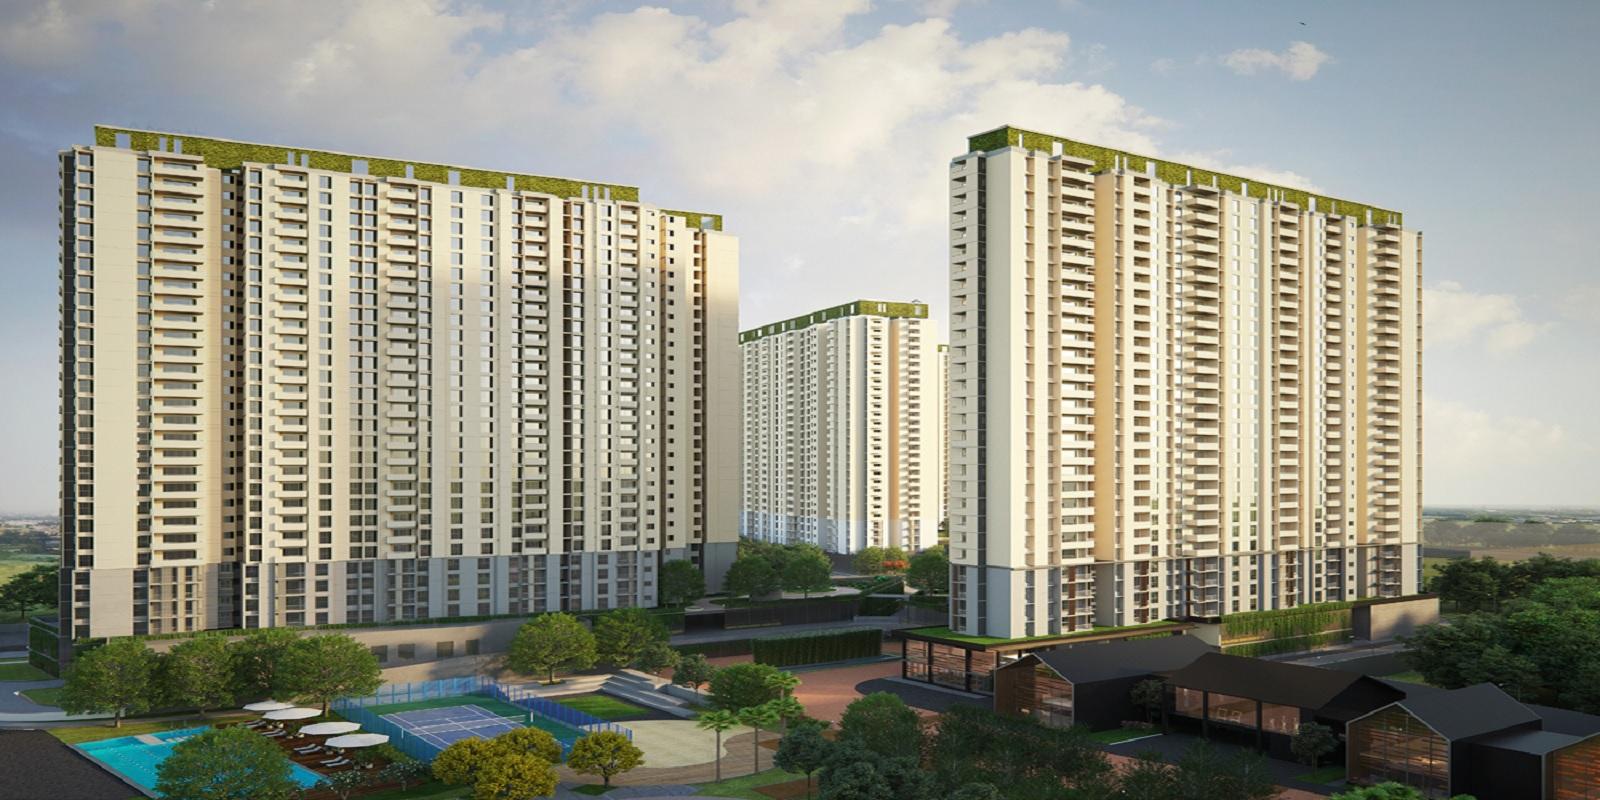 assetz homes marq phase 1 project large image13